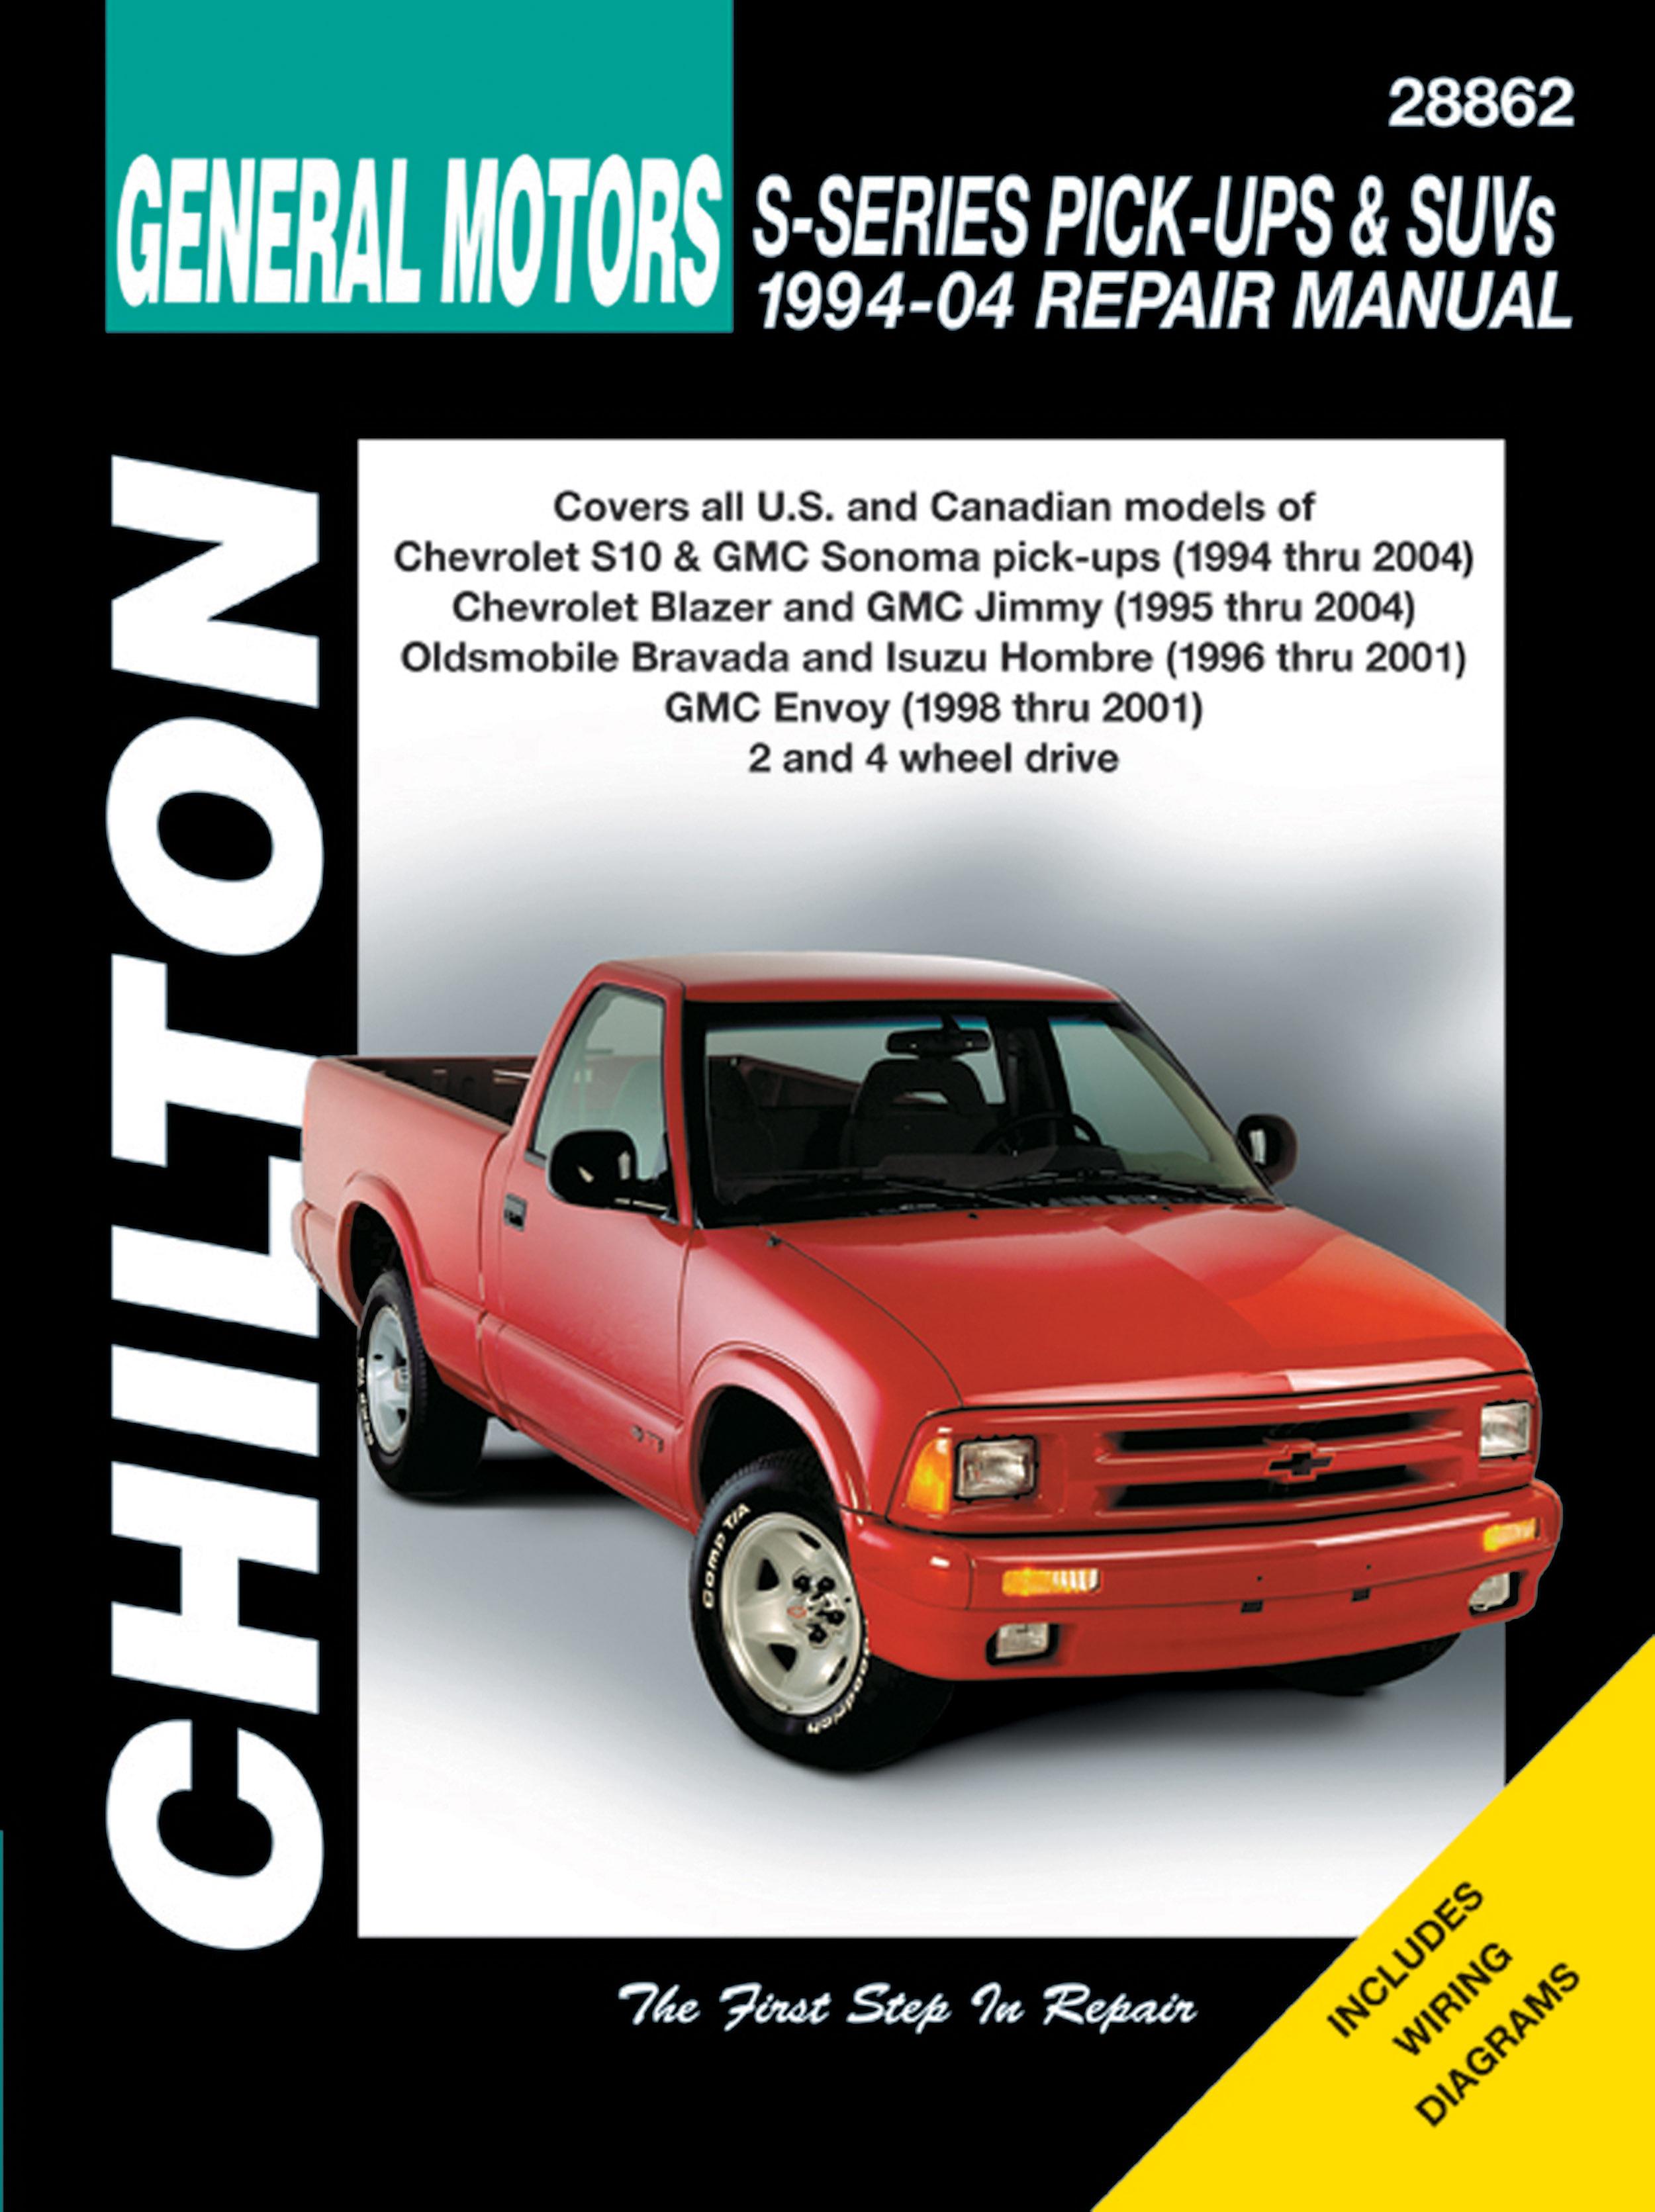 Chevrolet S10 Blazer (1994 - 1994) Chilton | Haynes ManualsHaynes Manuals